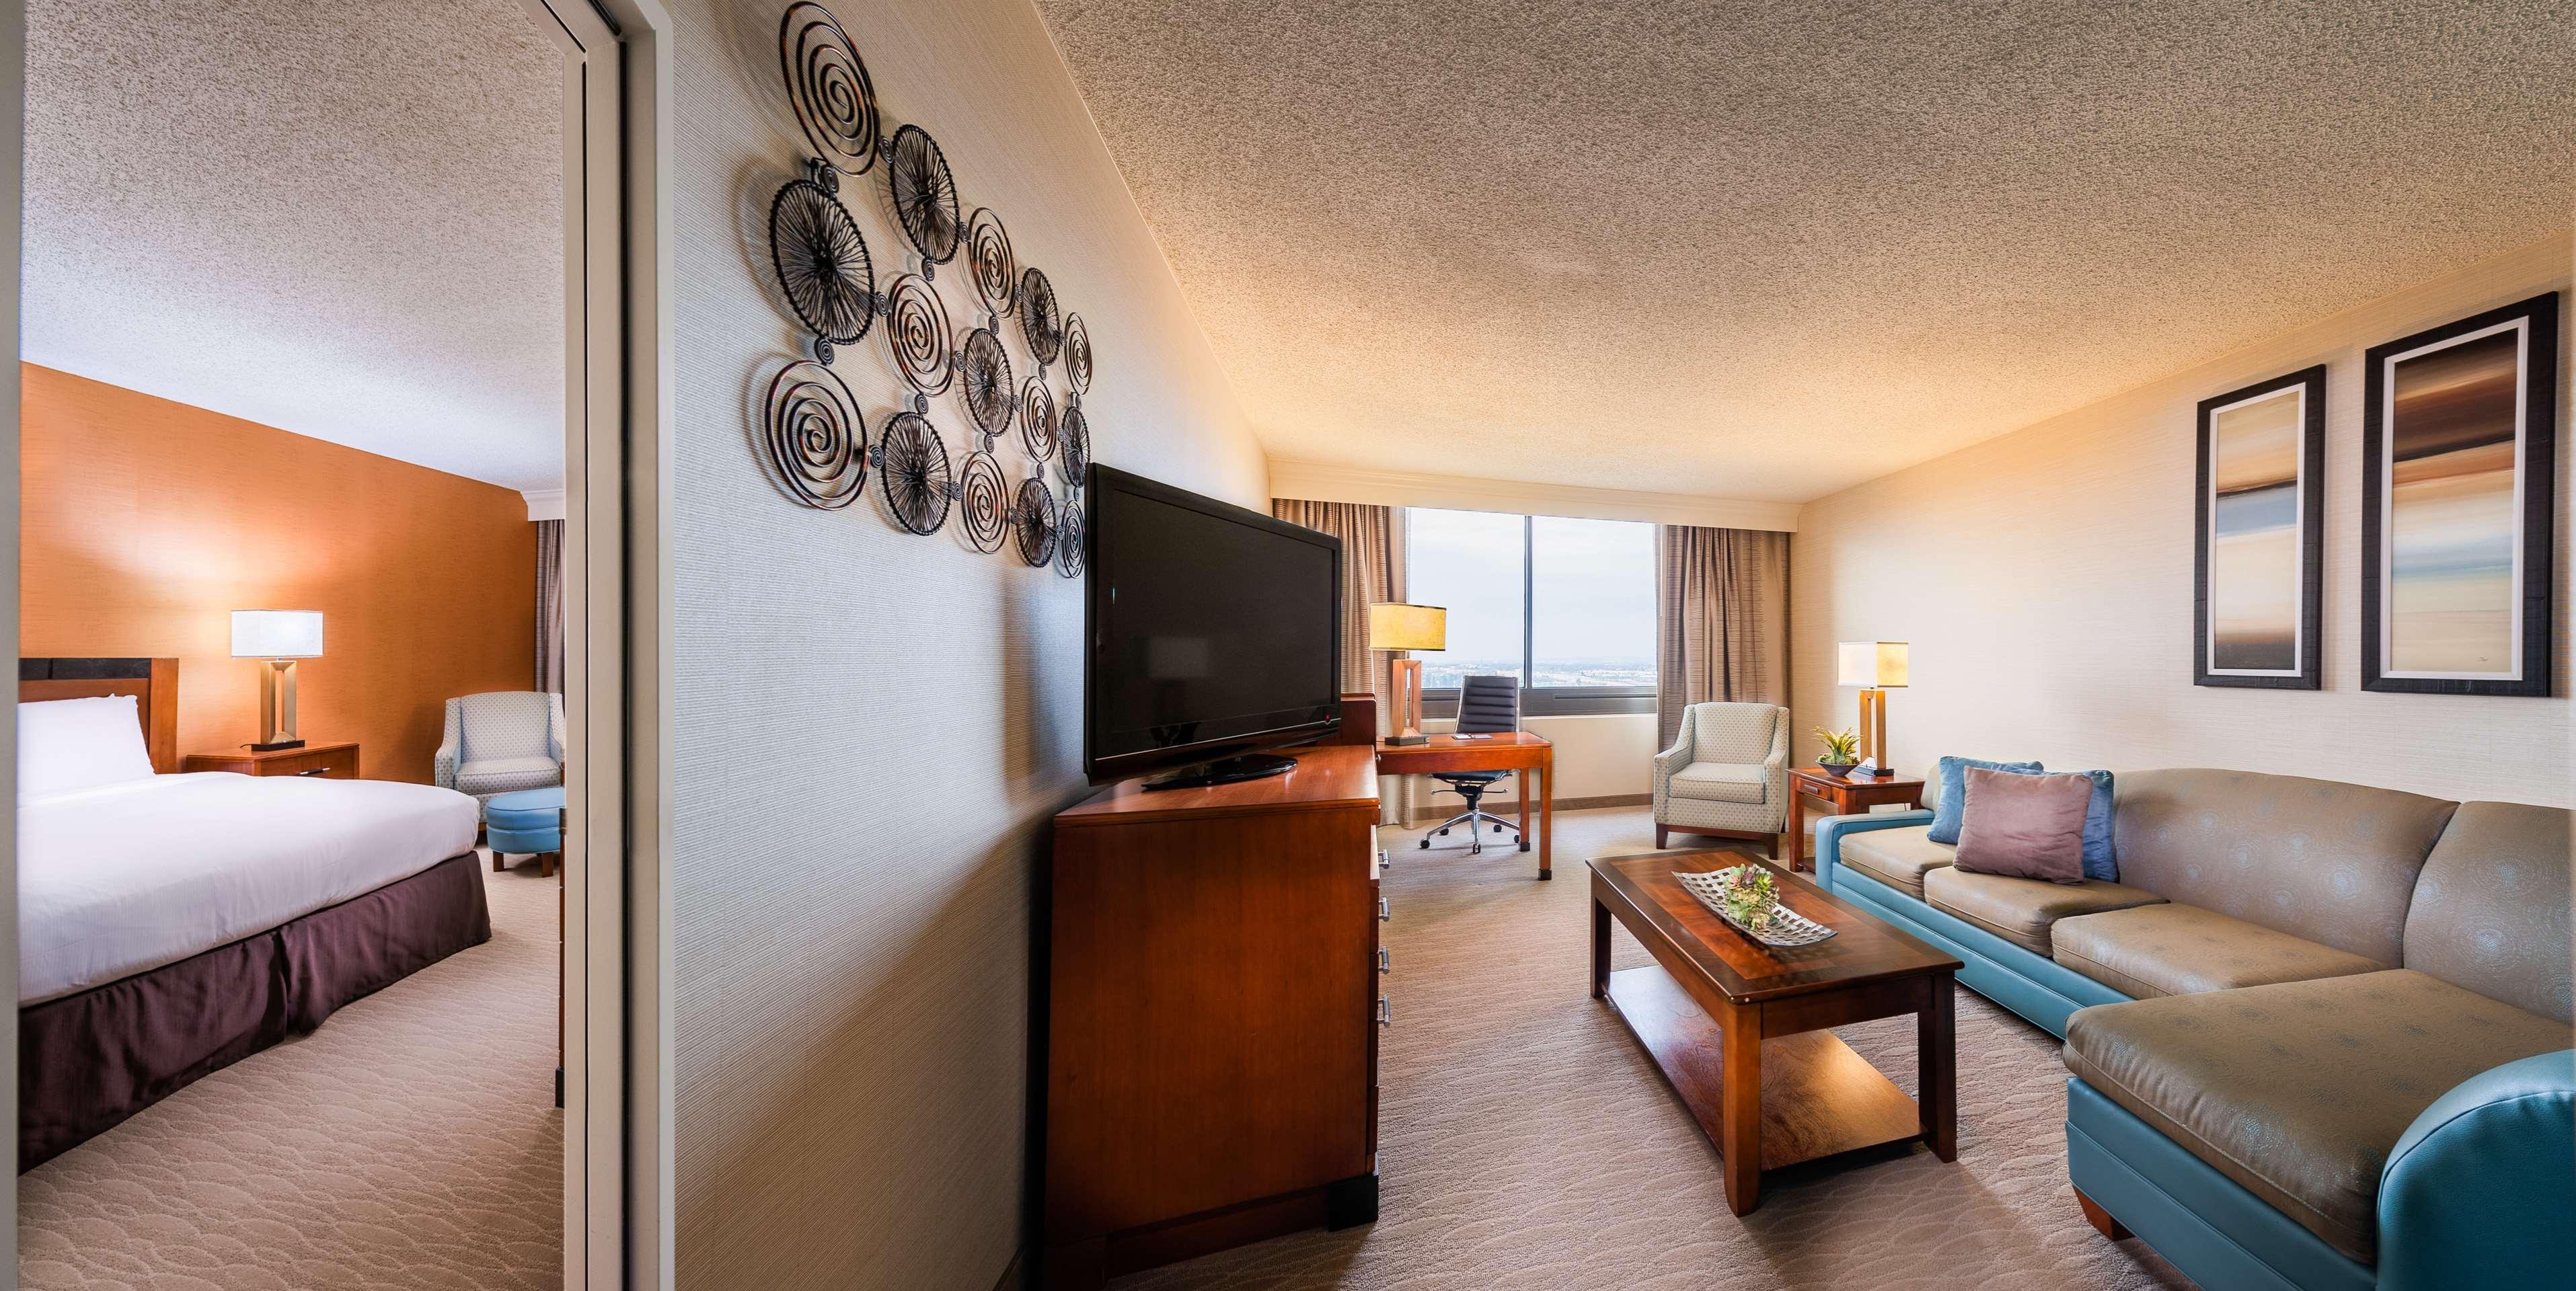 DoubleTree by Hilton Hotel Anaheim - Orange County image 36